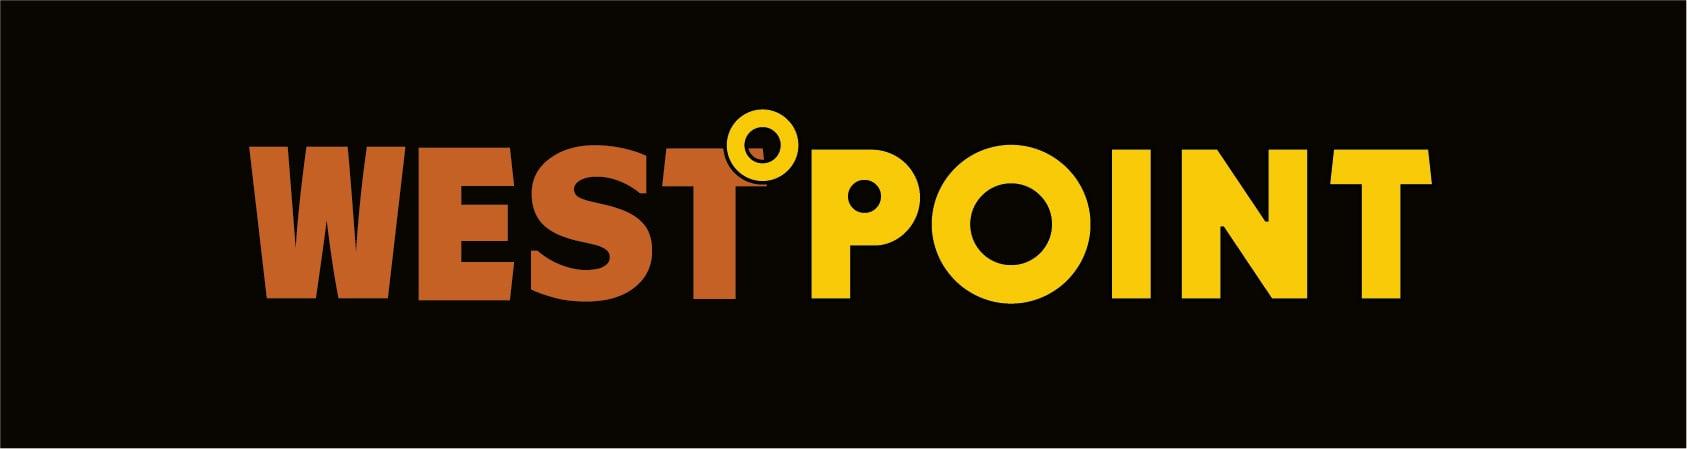 westpointB